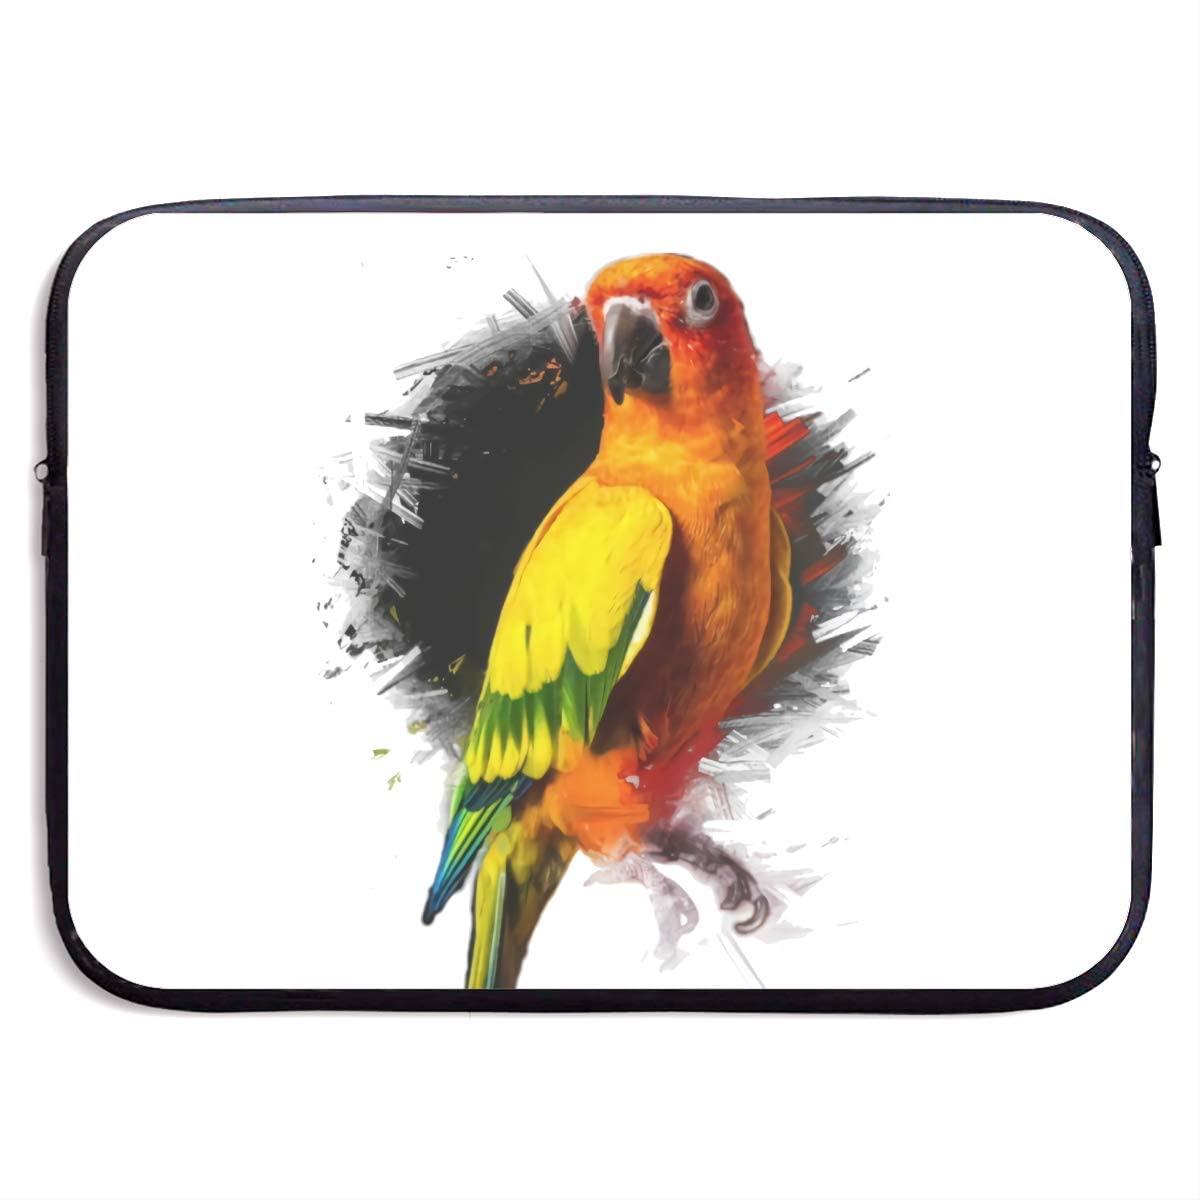 Logan Paul Laptop Bag, Laptop Case, Briefcase Messenger Shoulder Bag for Men Women 15 Inch